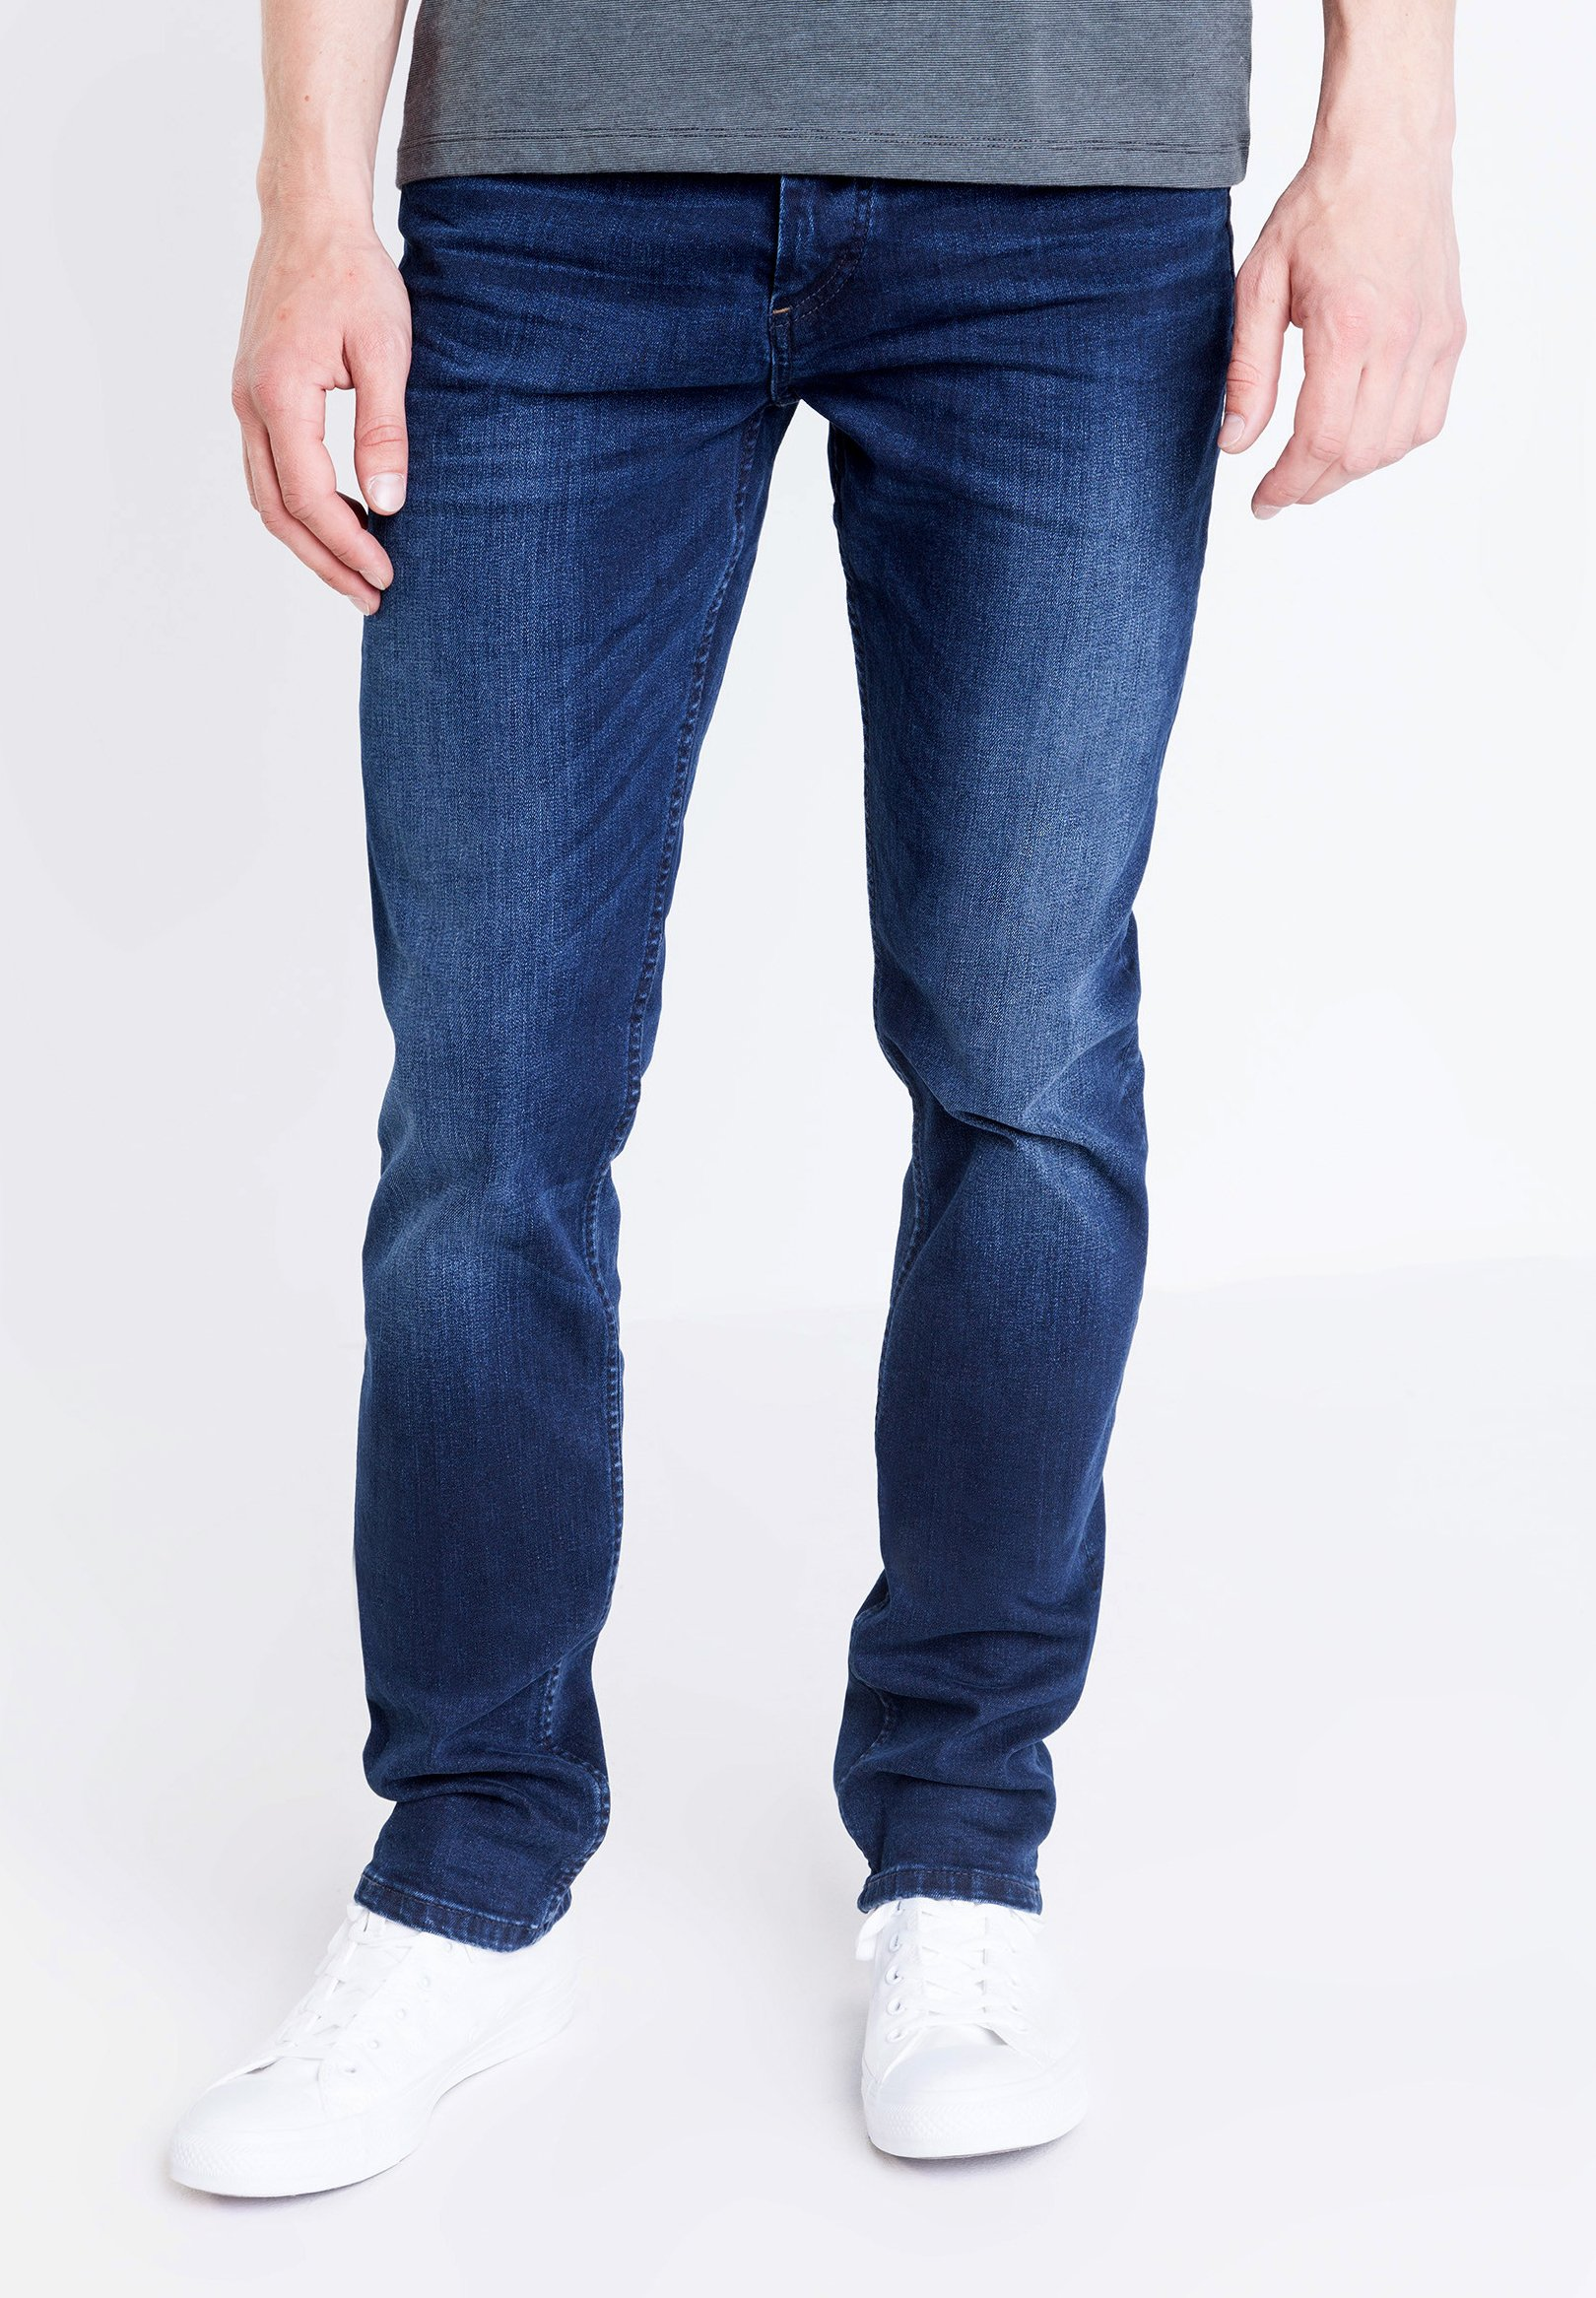 Bonobo Jeans Straight Leg - Denim Stone MCo0W9T